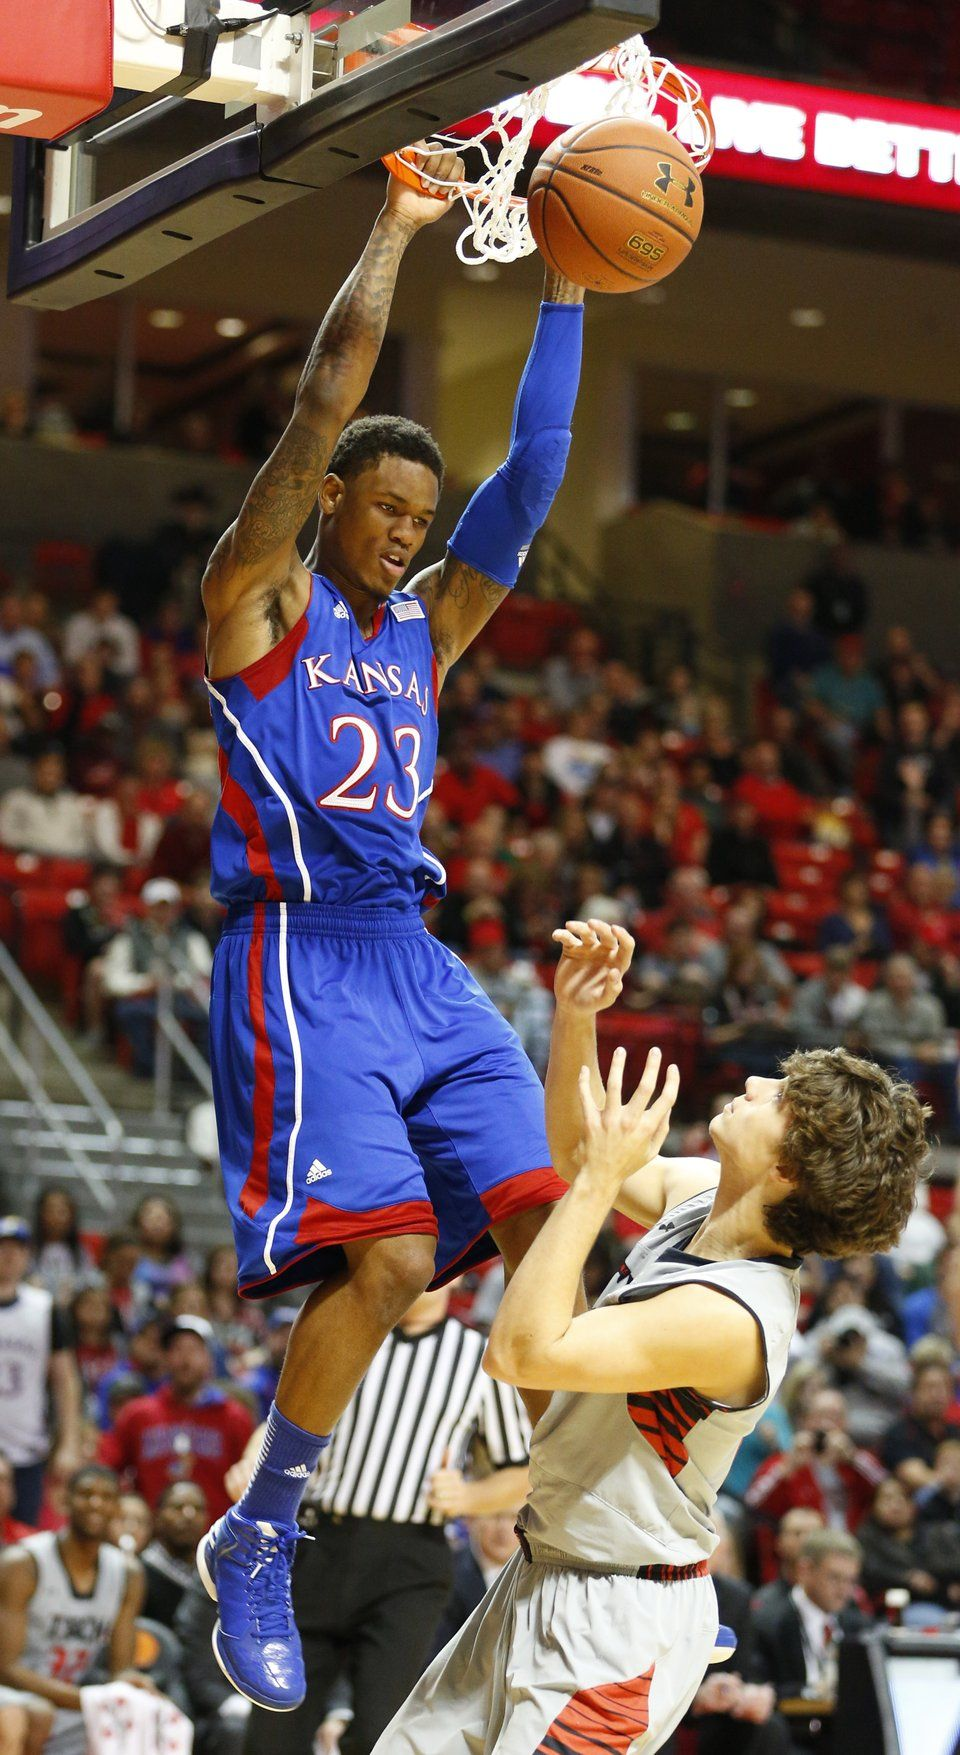 Kansas guard Ben McLemore finishes a putback dunk over